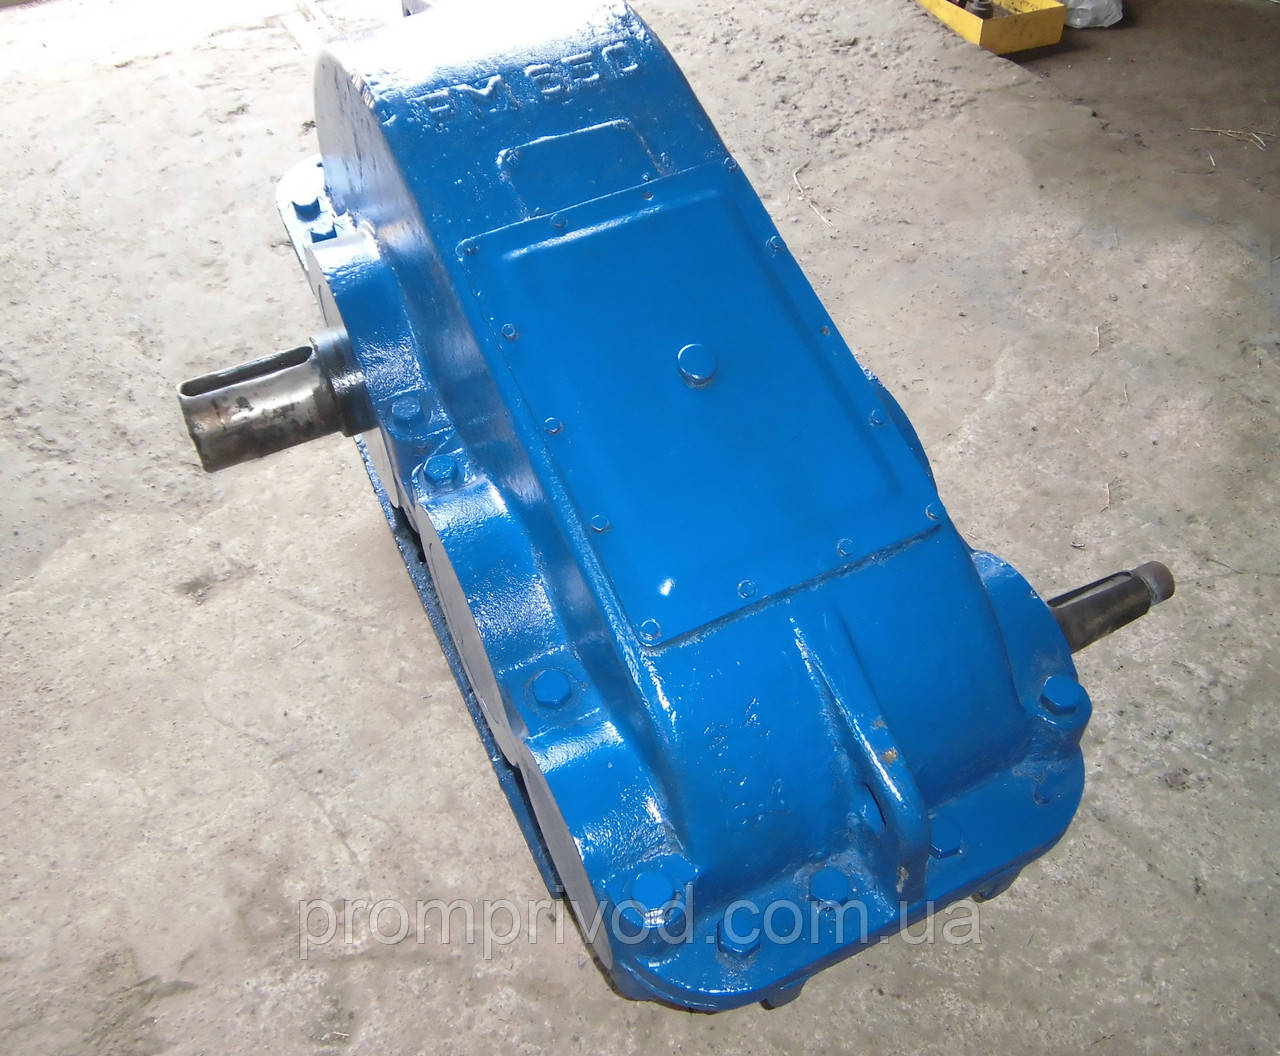 Редуктор РМ-650-31.5-22